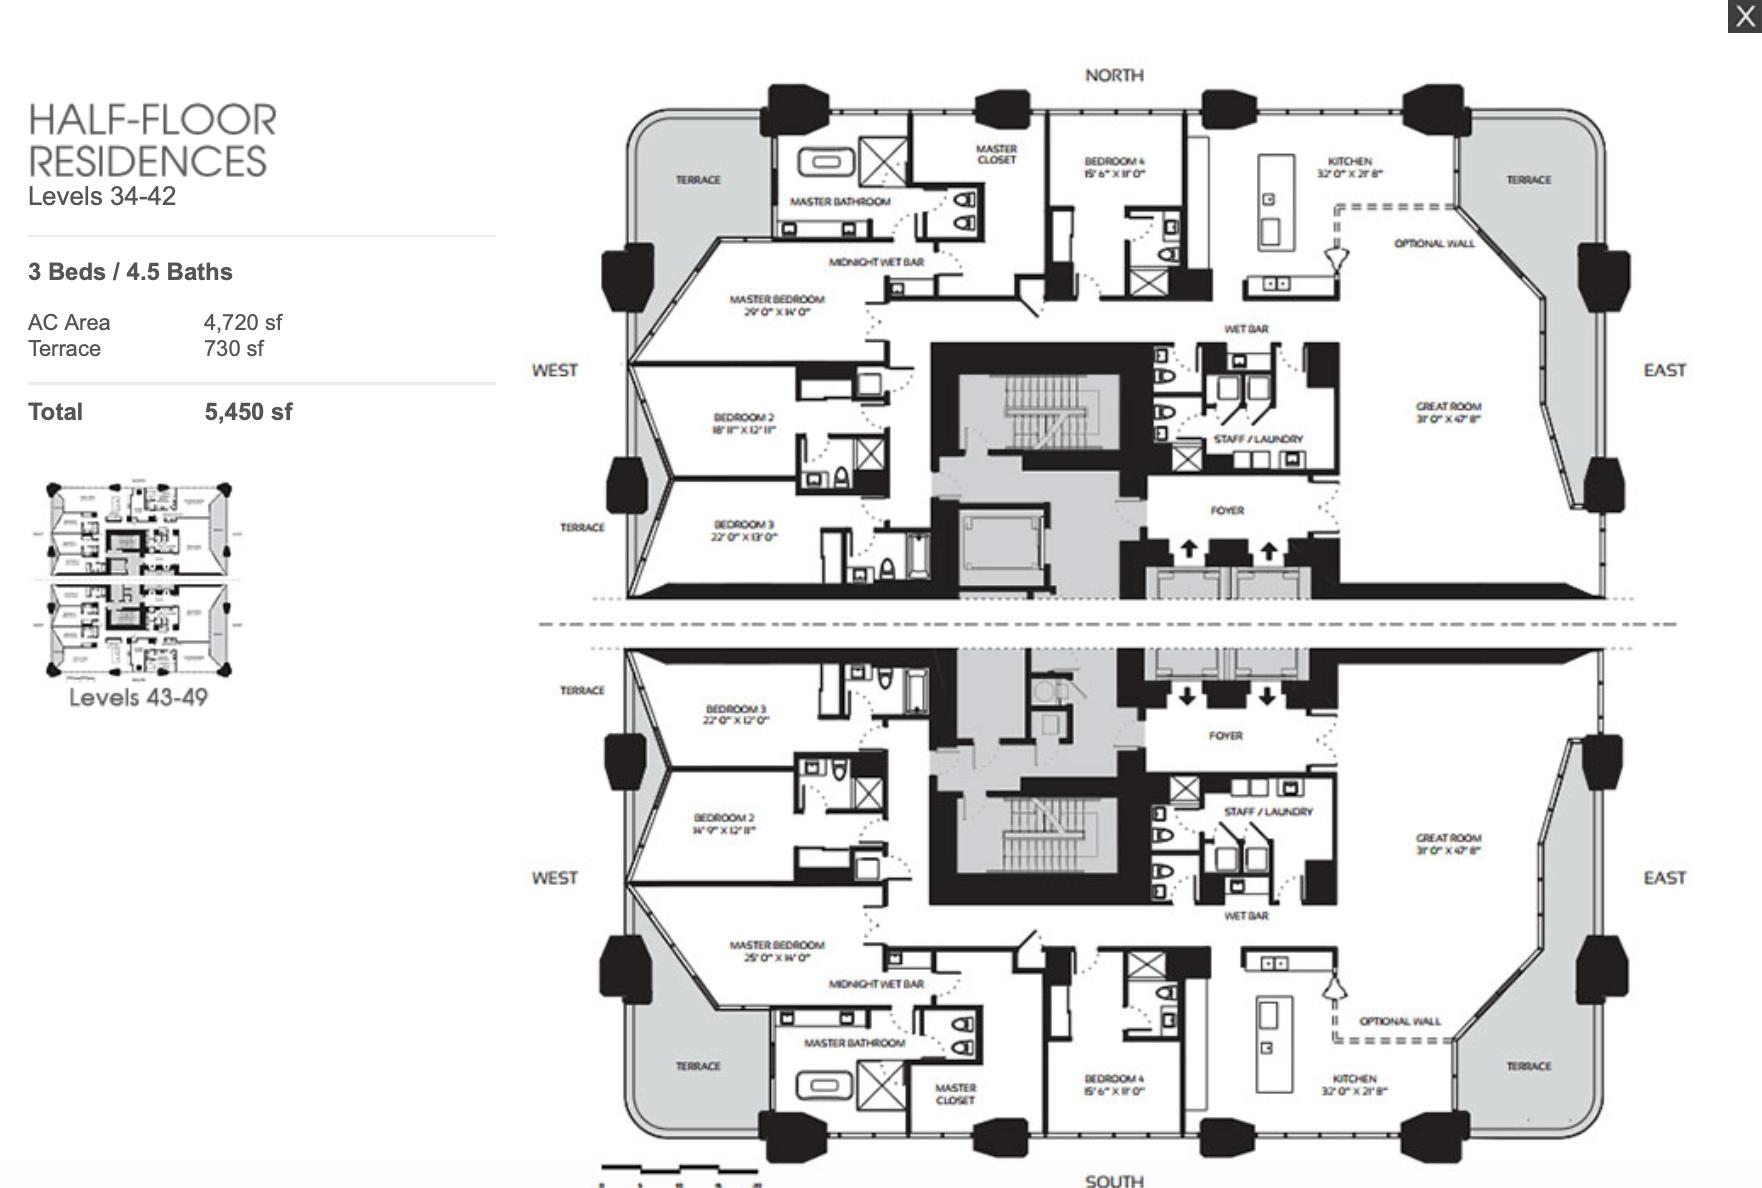 Half Floor Residences 26-33